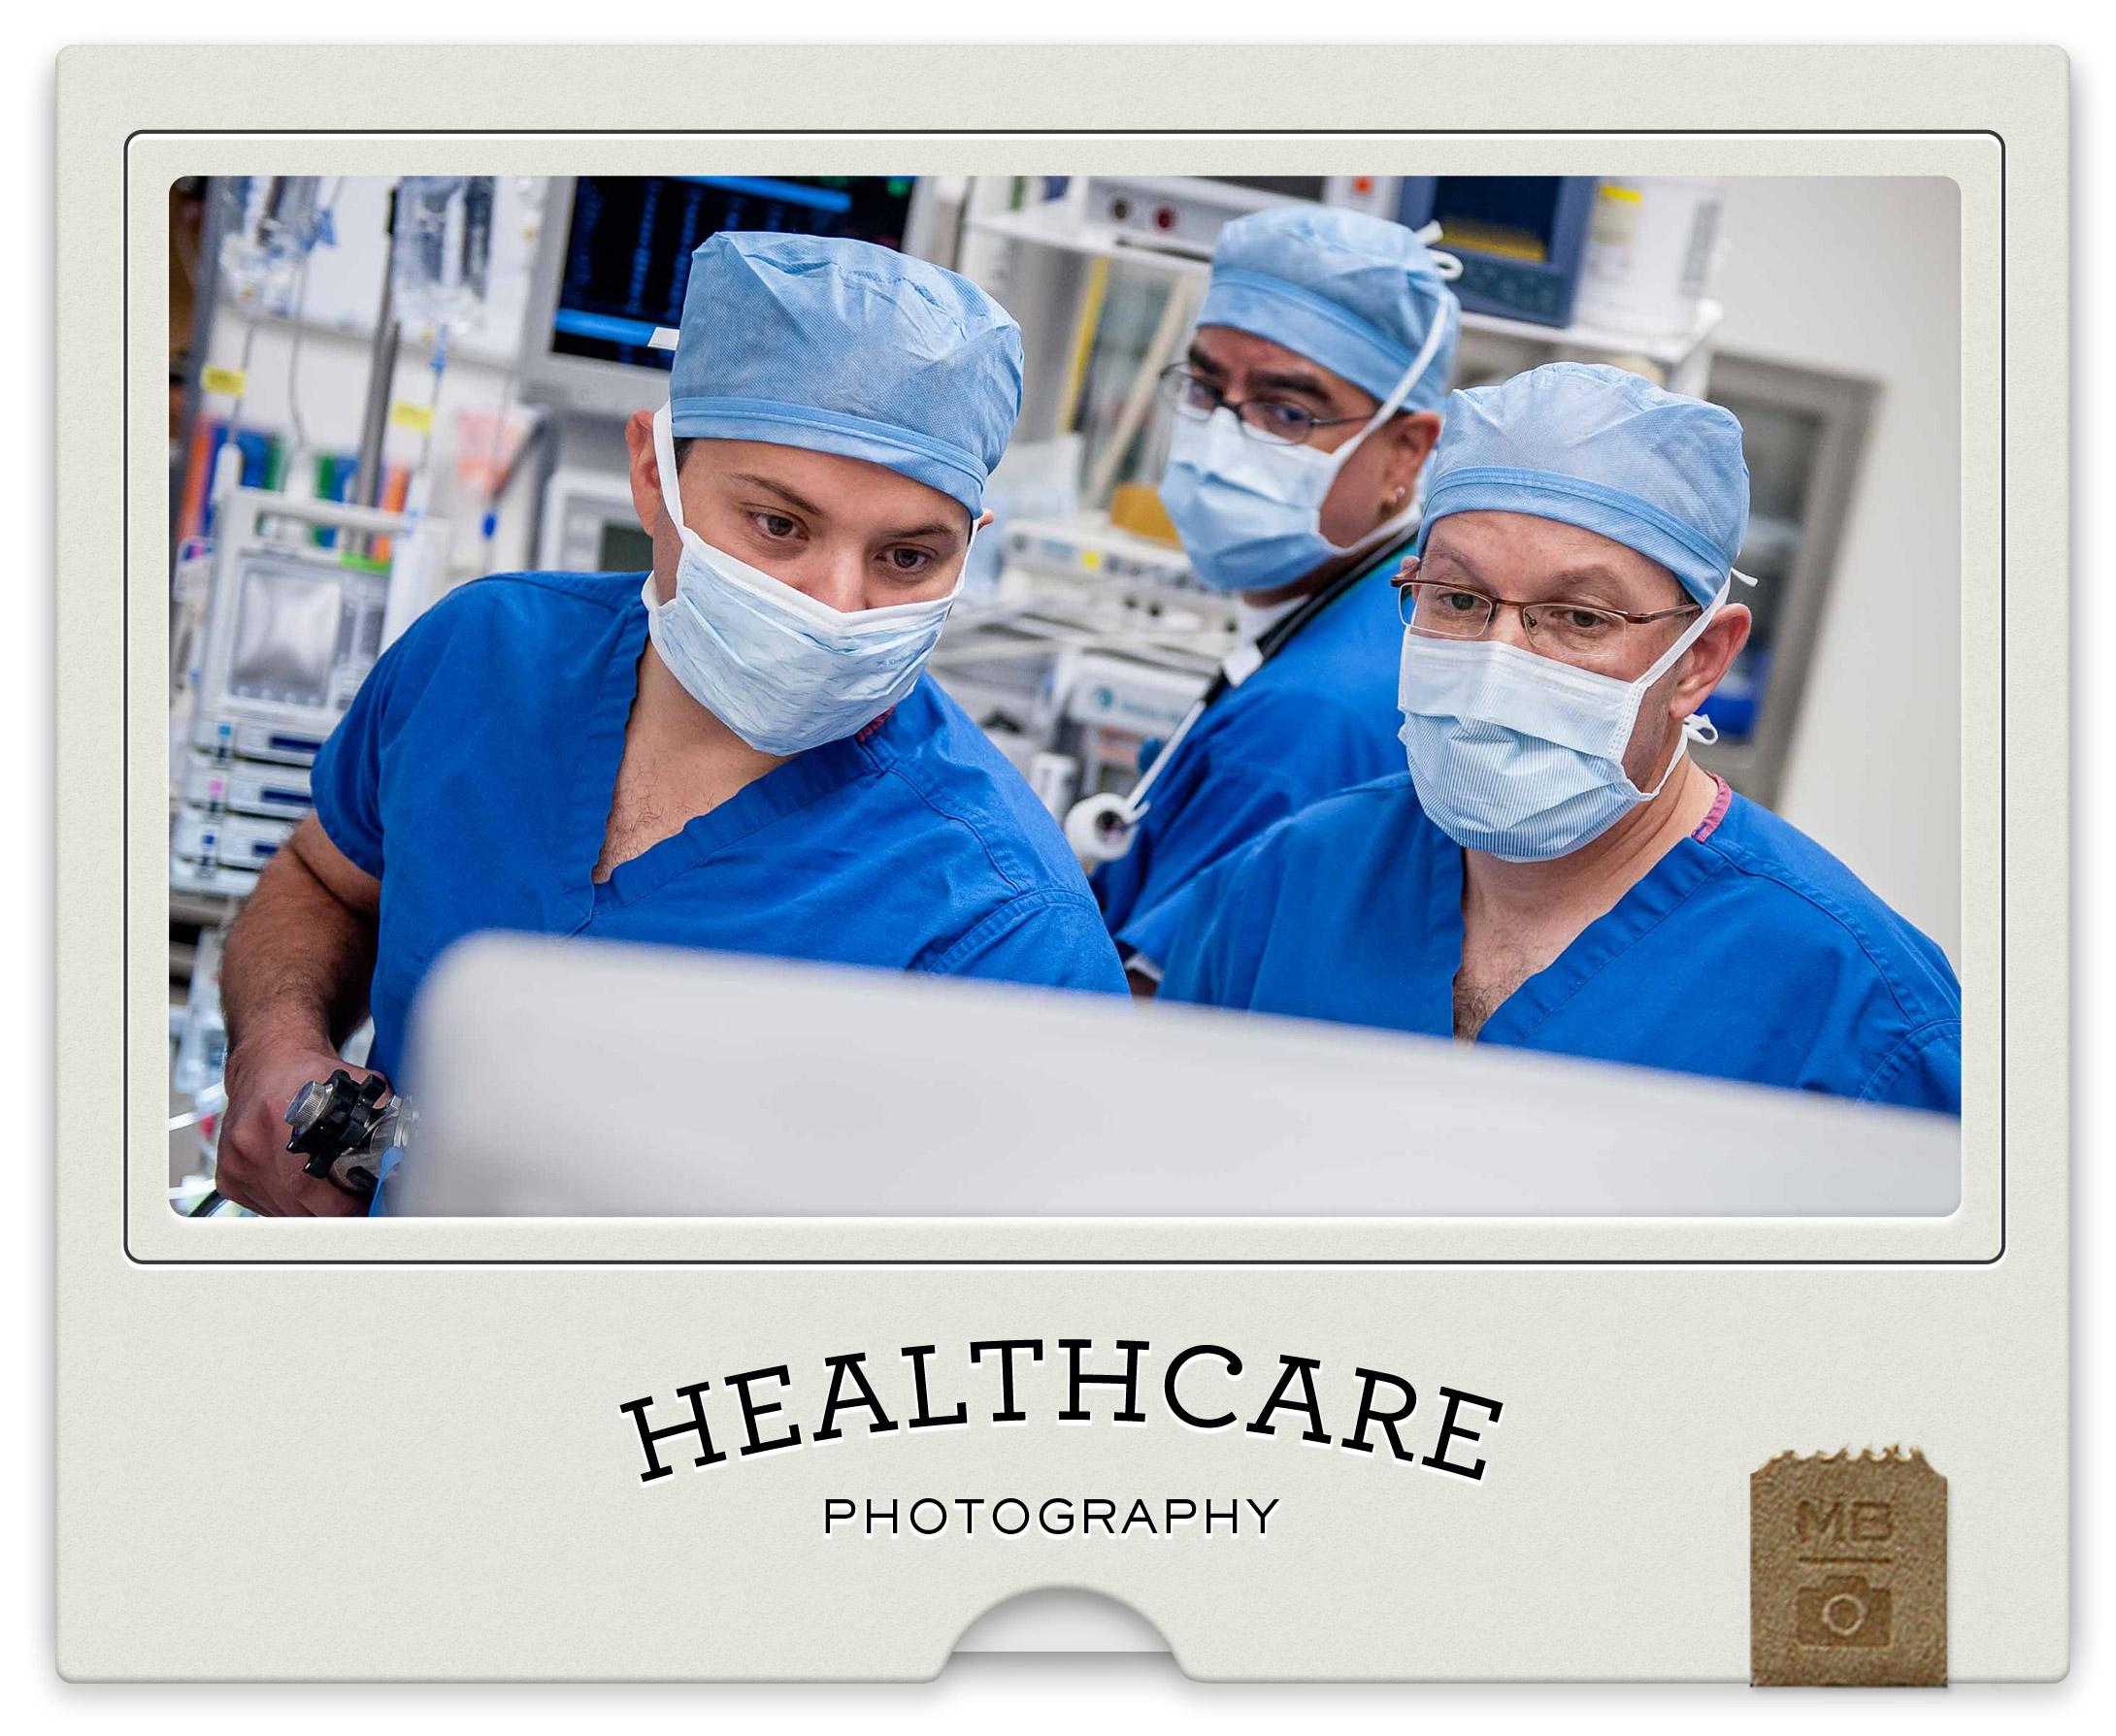 Healthcare-Thumb.jpg